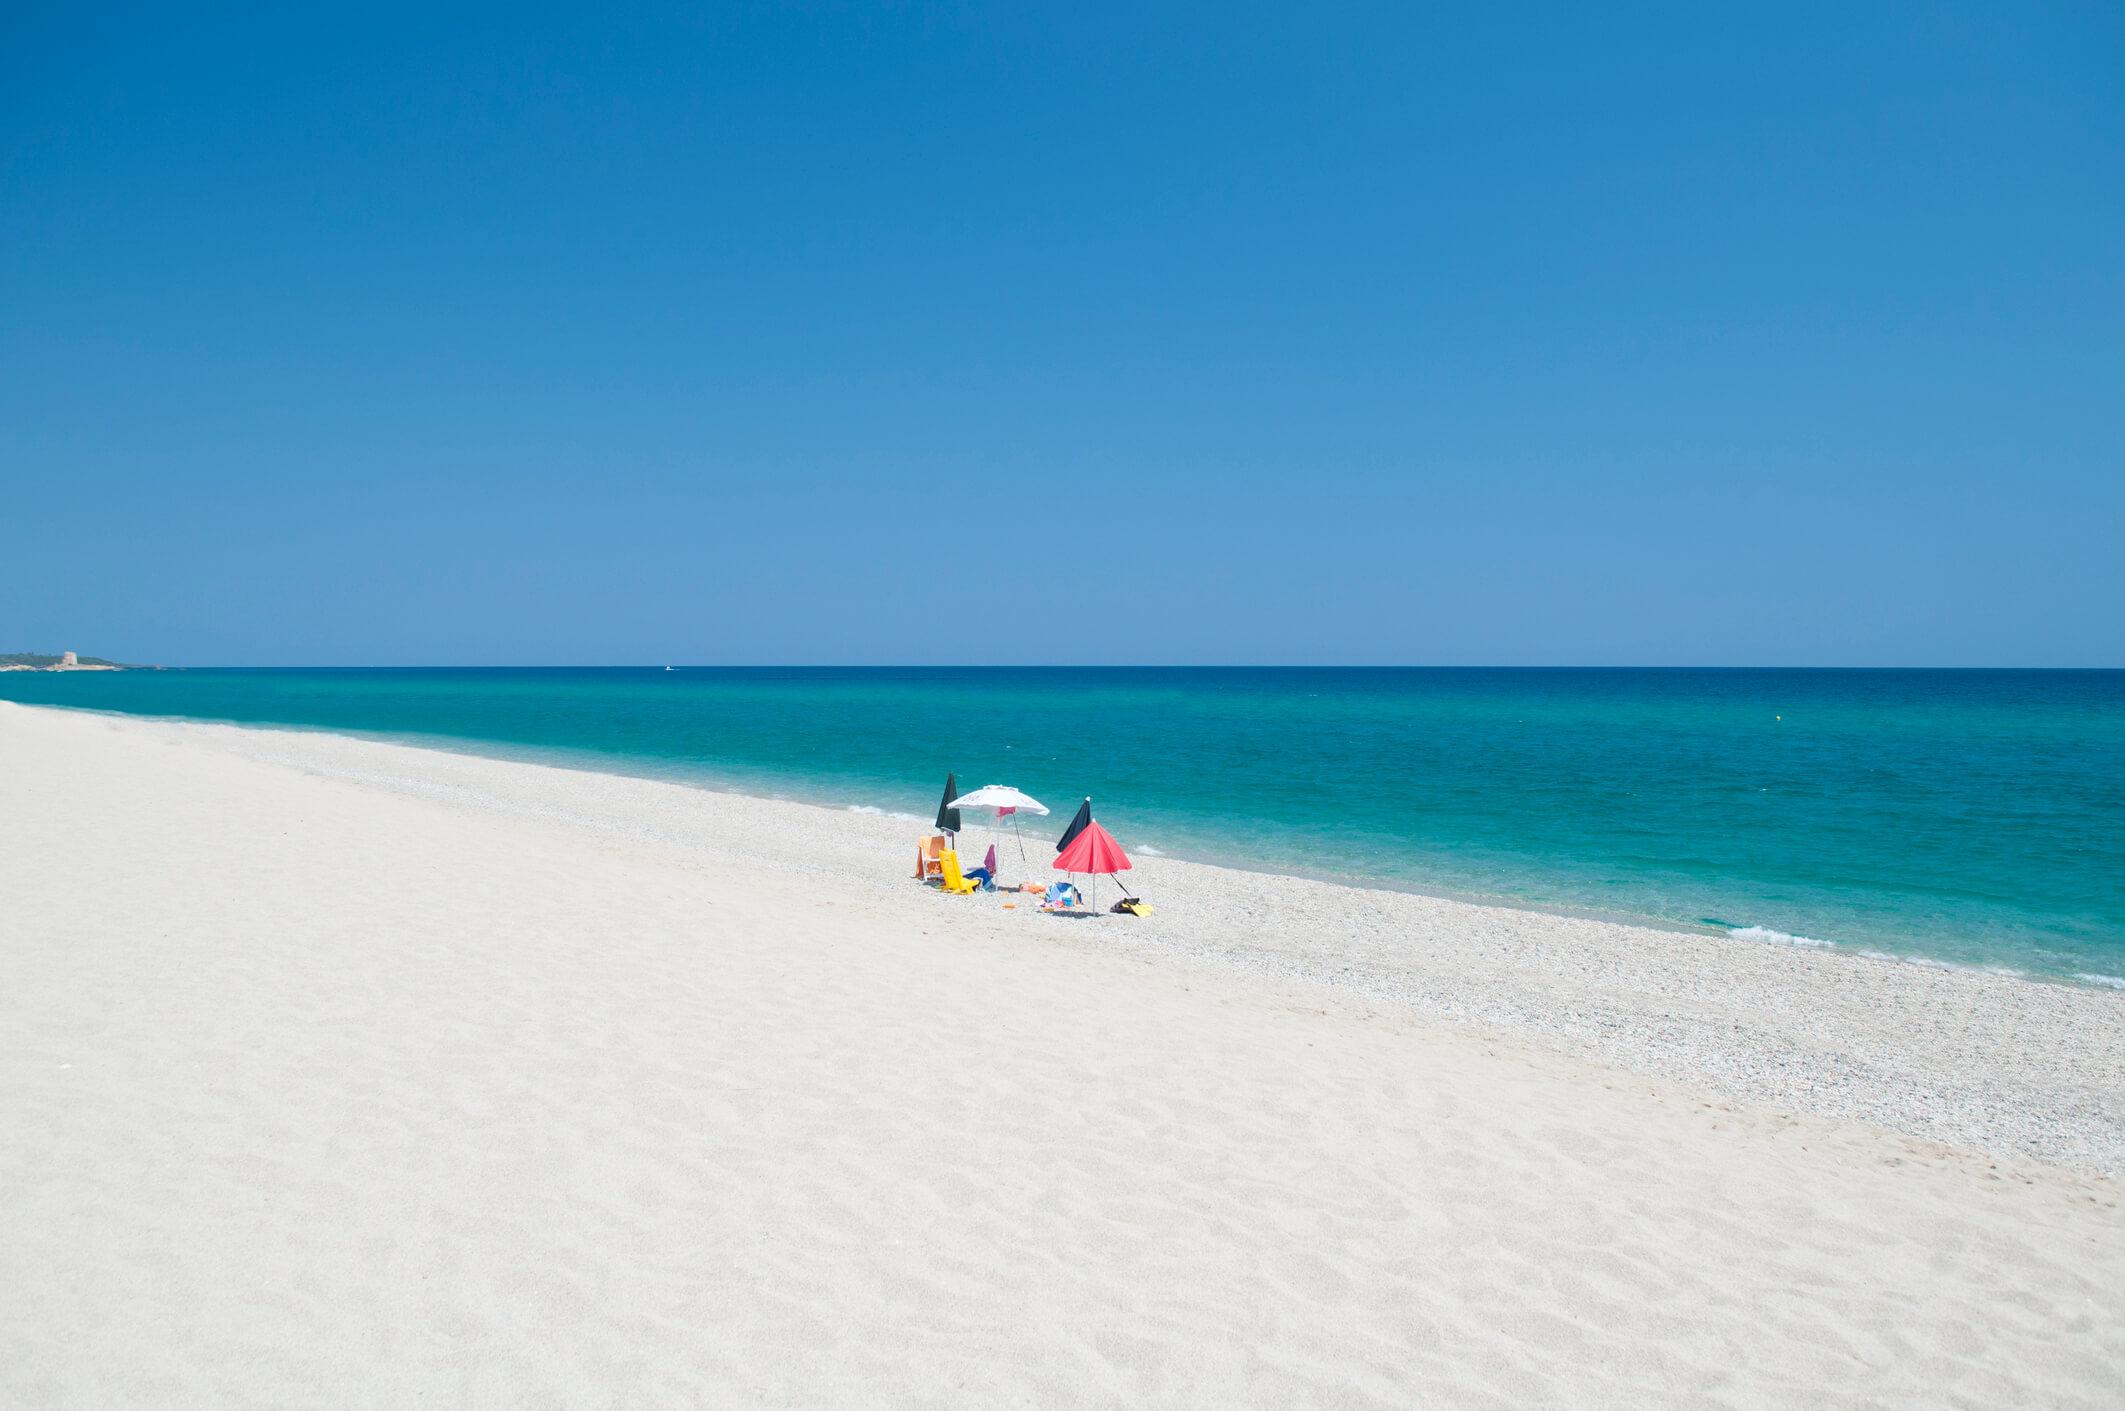 Oferta viaje al Cabo de Gata Viajes Carrefour